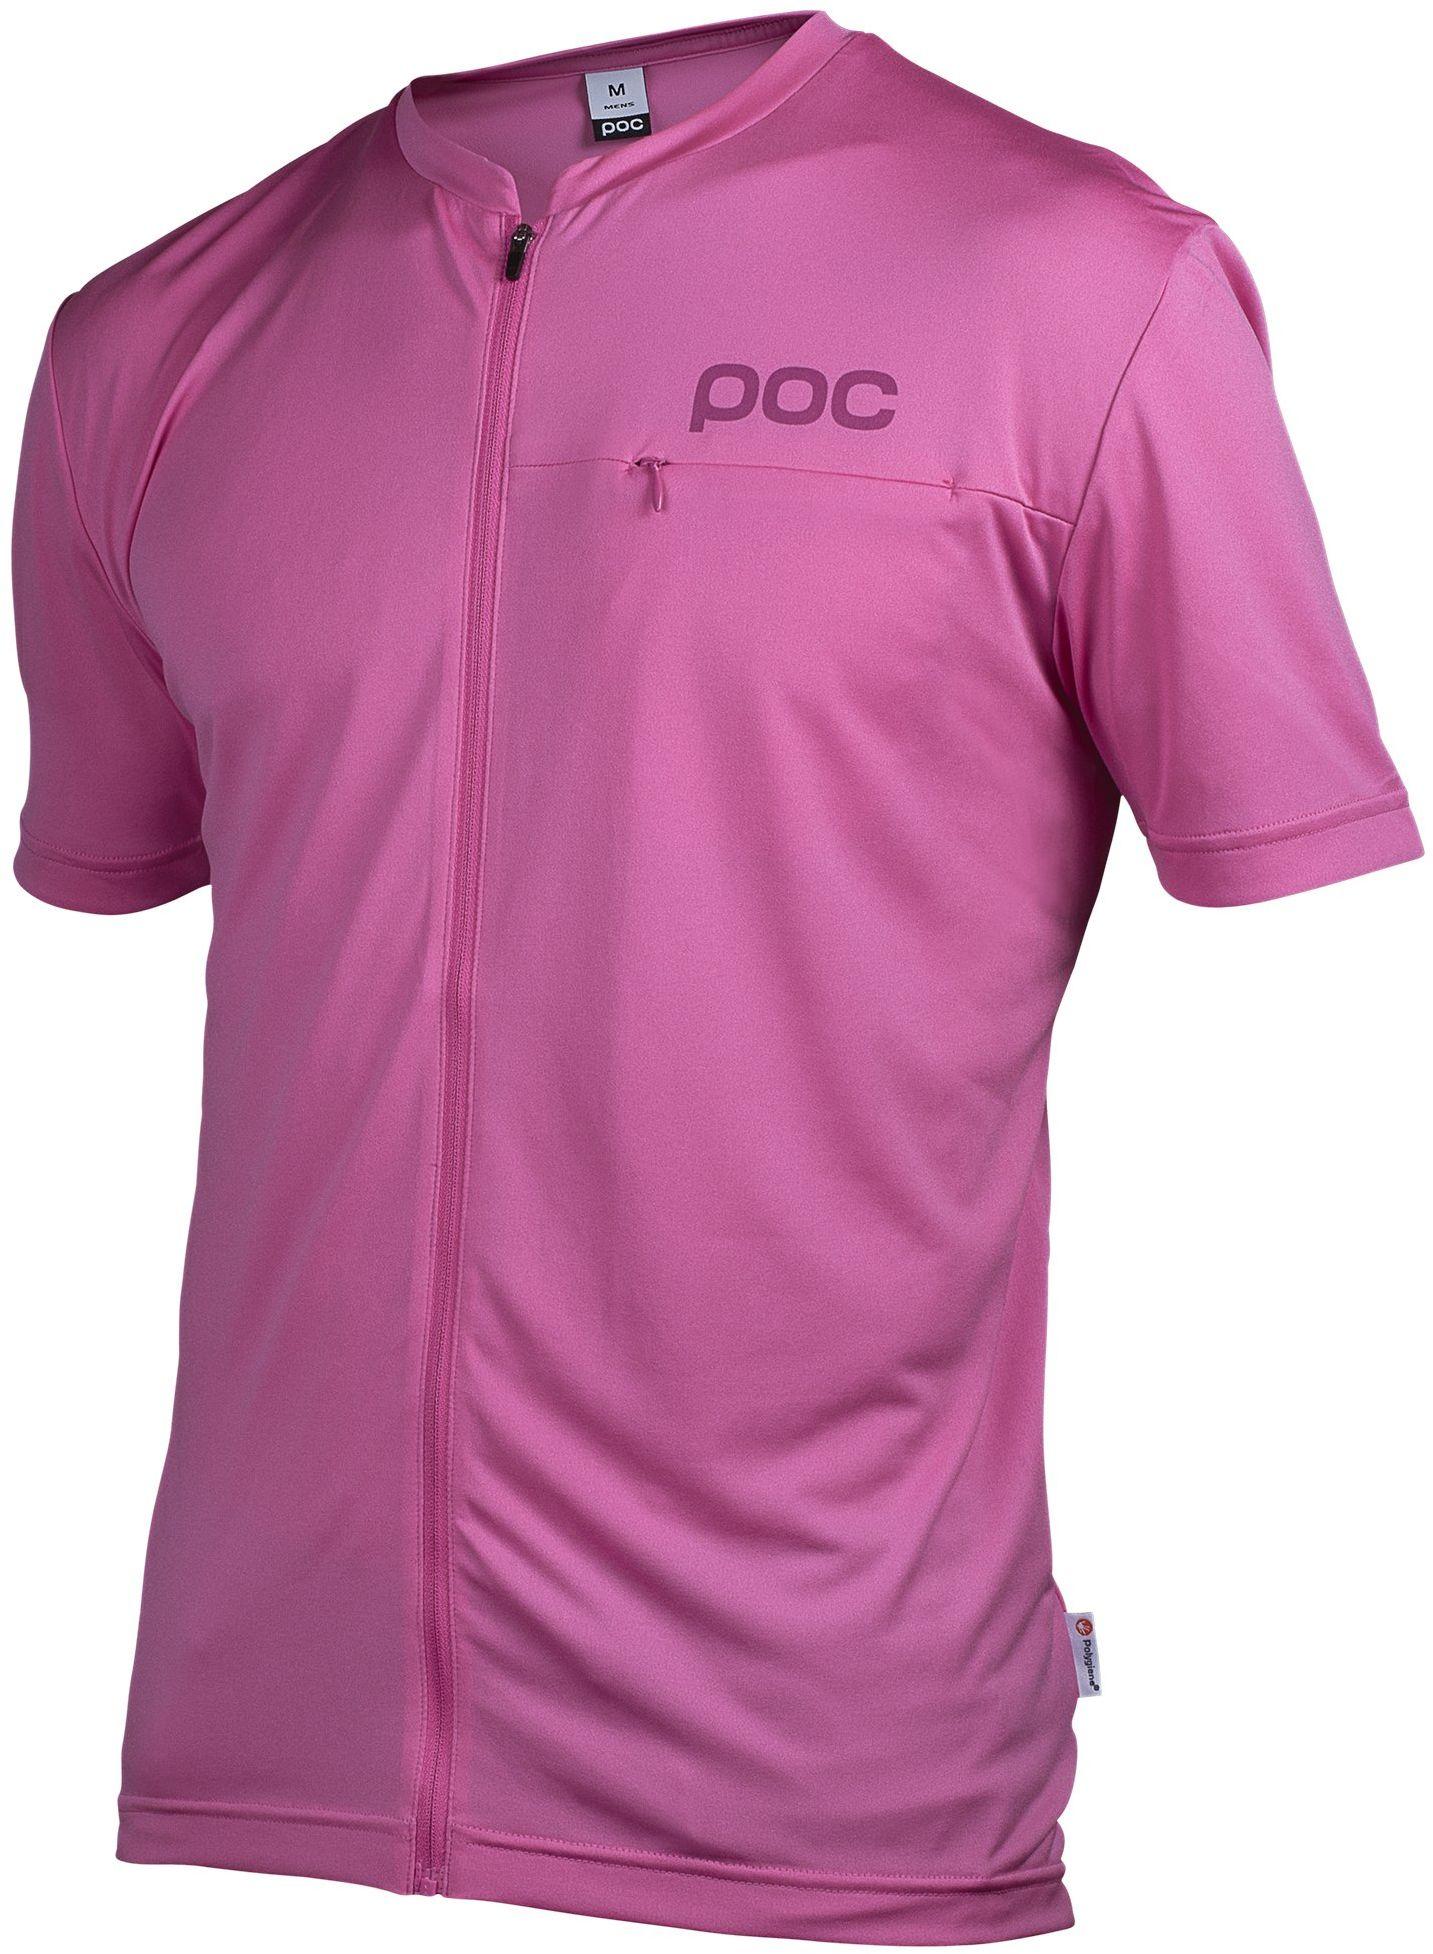 POC Męska koszulka rowerowa Trail Light Zip Tee, Sulfur Pink, XL, 52155